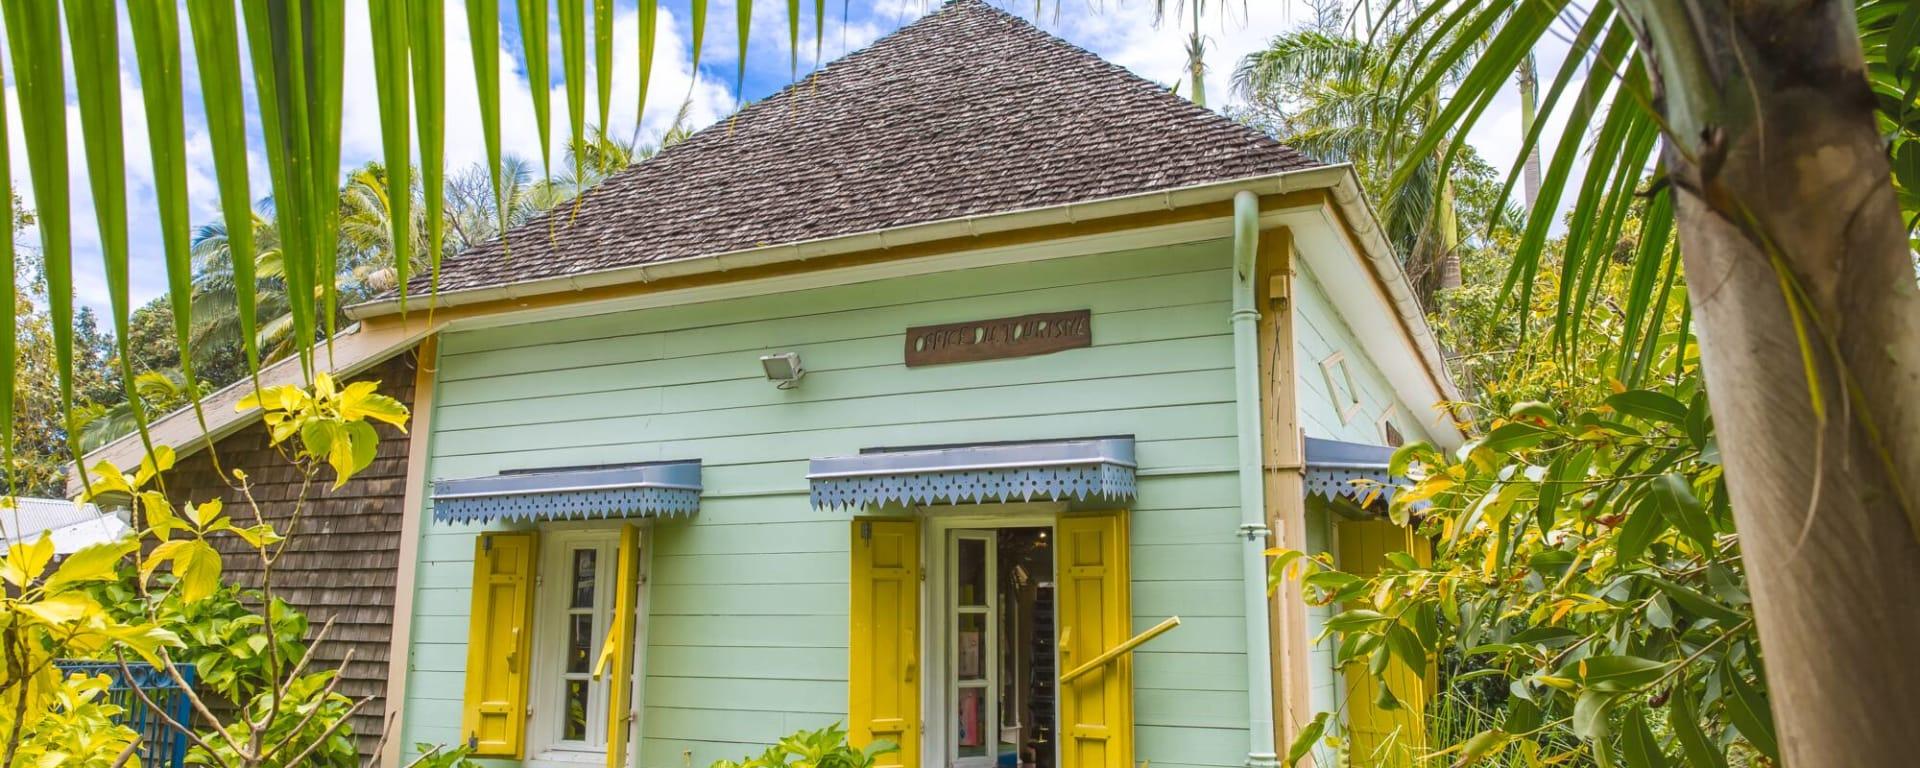 Höhepunkte La Réunion ab Küstenregion: Reunion Cilaos kreolisches Haus